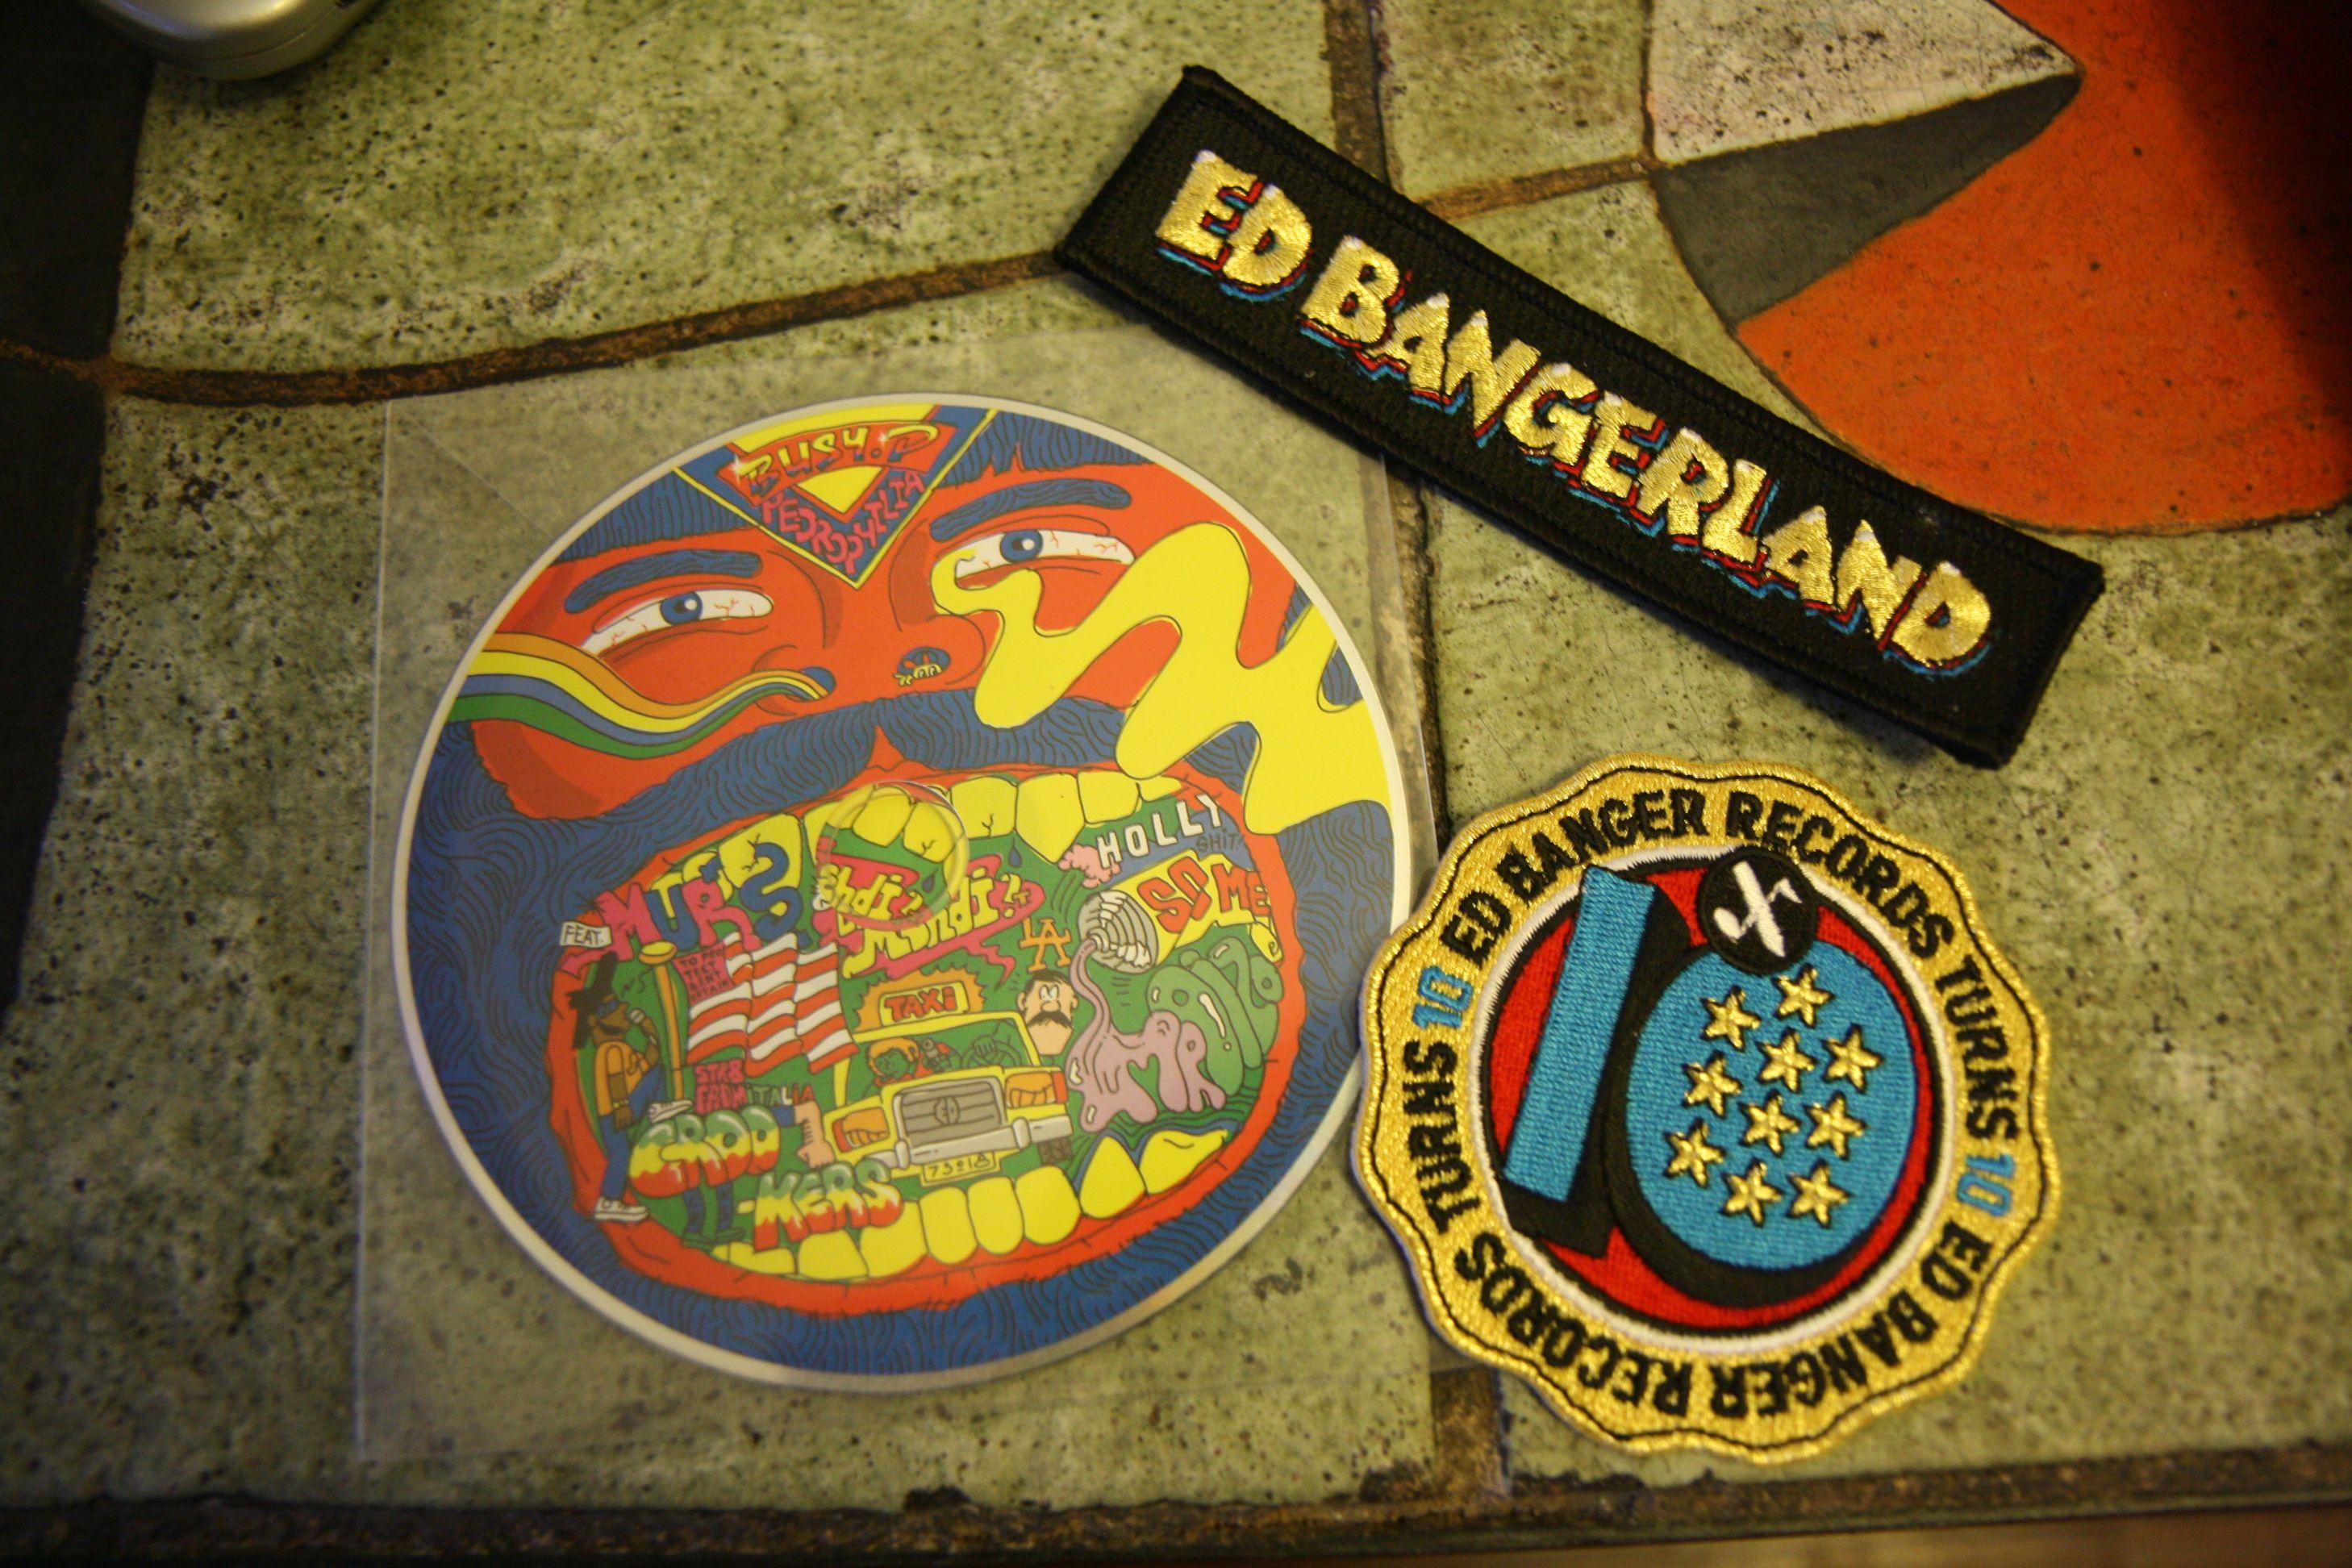 Ed Banger stickers